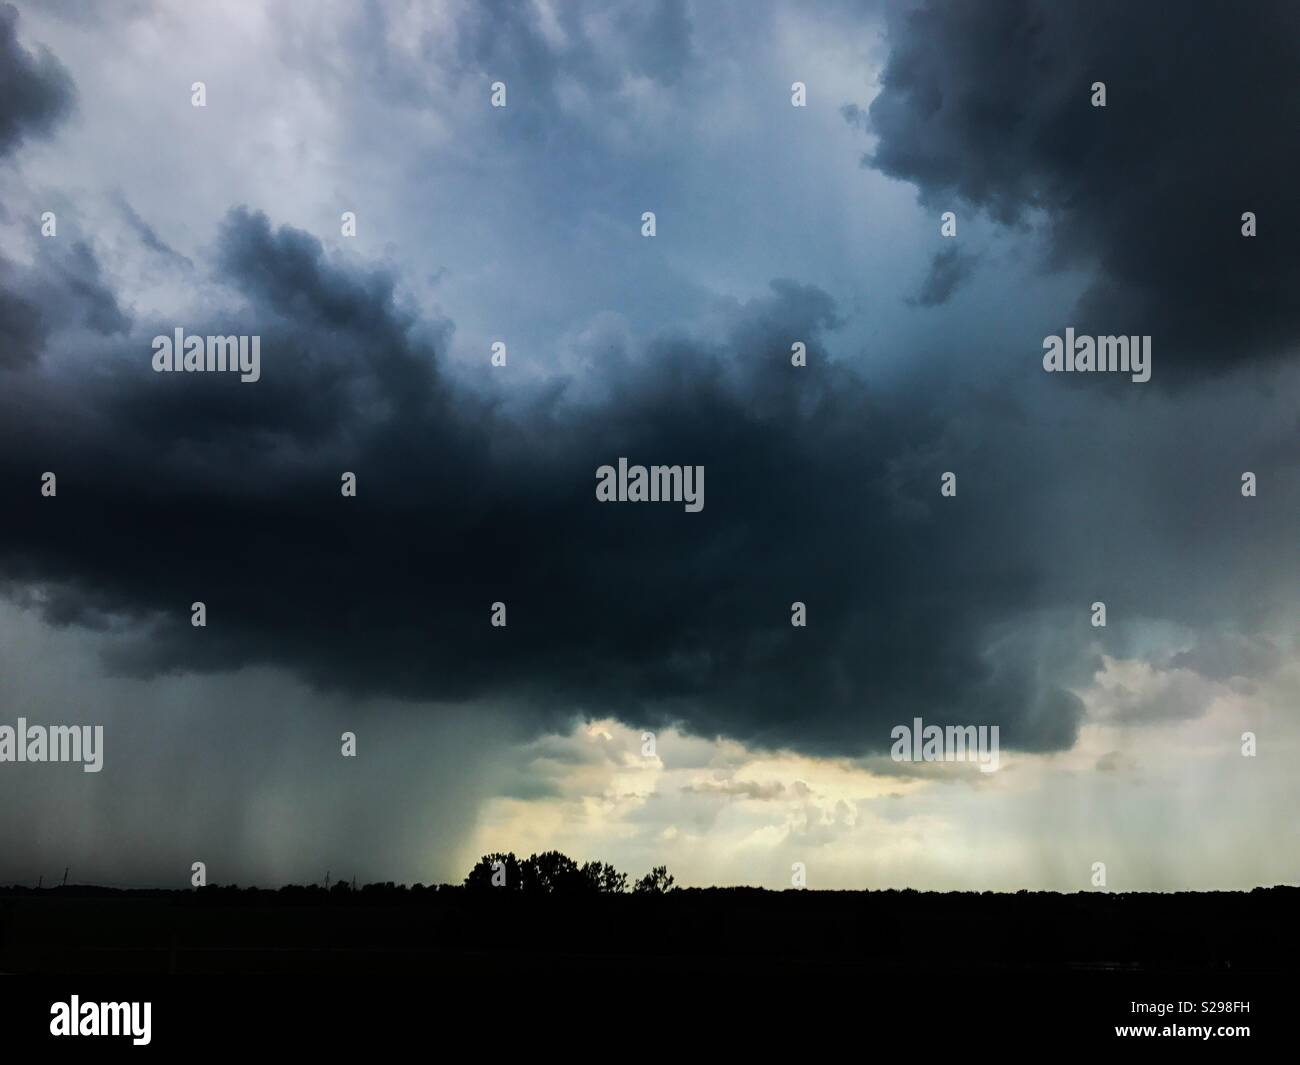 Ominous rain cloud - Stock Image